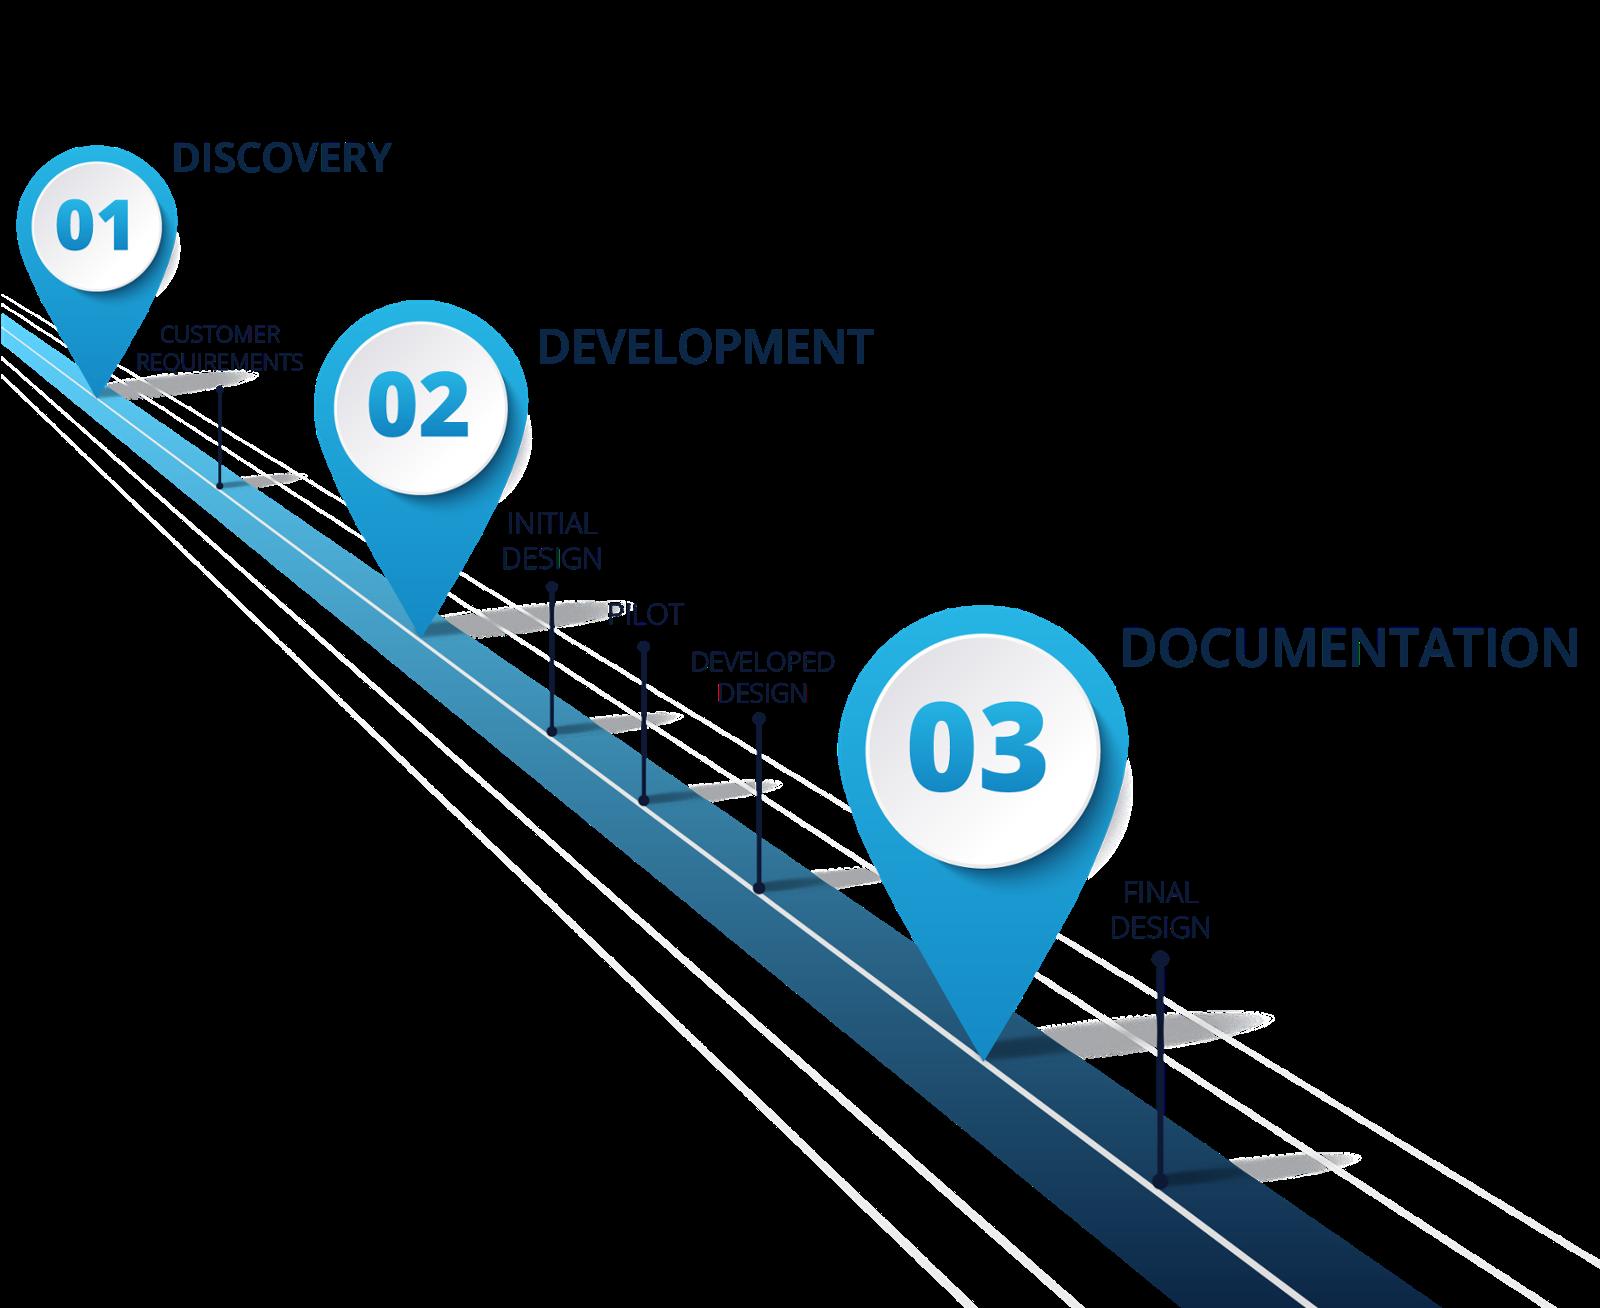 Discovery Development Documentation